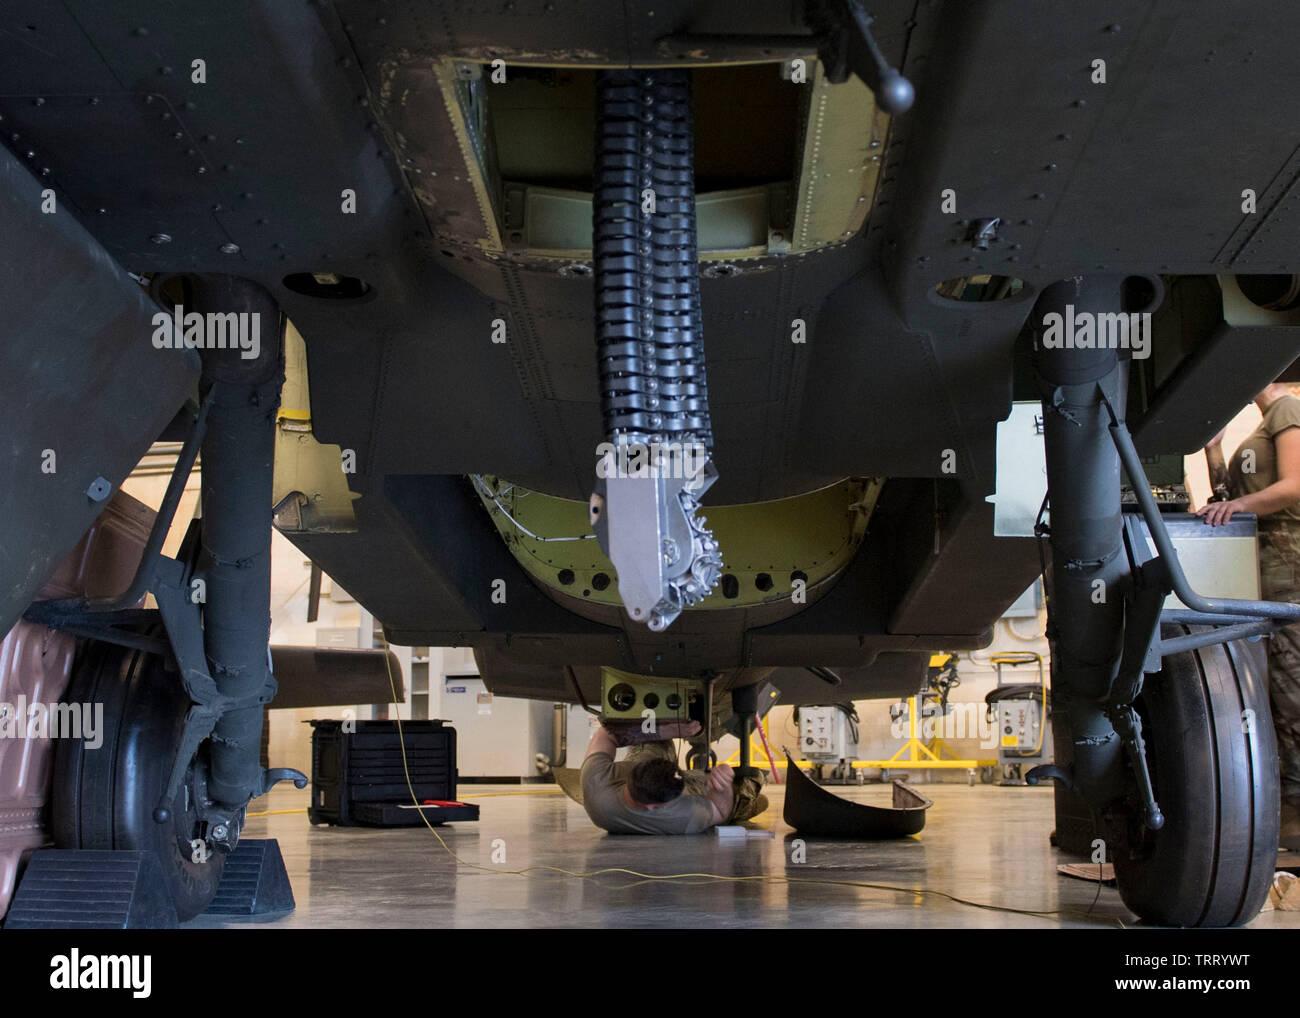 Avionic Stock Photos & Avionic Stock Images - Alamy